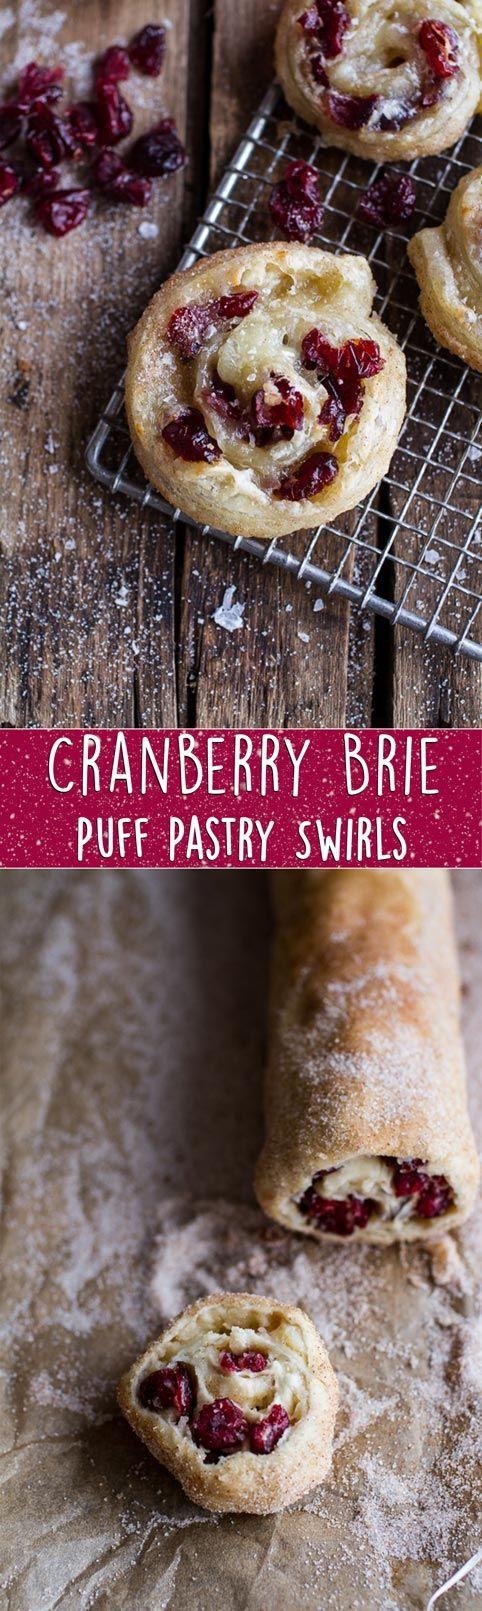 Five-Ingredient Cranberry and Brie Cinnamon Sugar Puff Pastry Swirls | halfbakedharvest.com @hbharvest